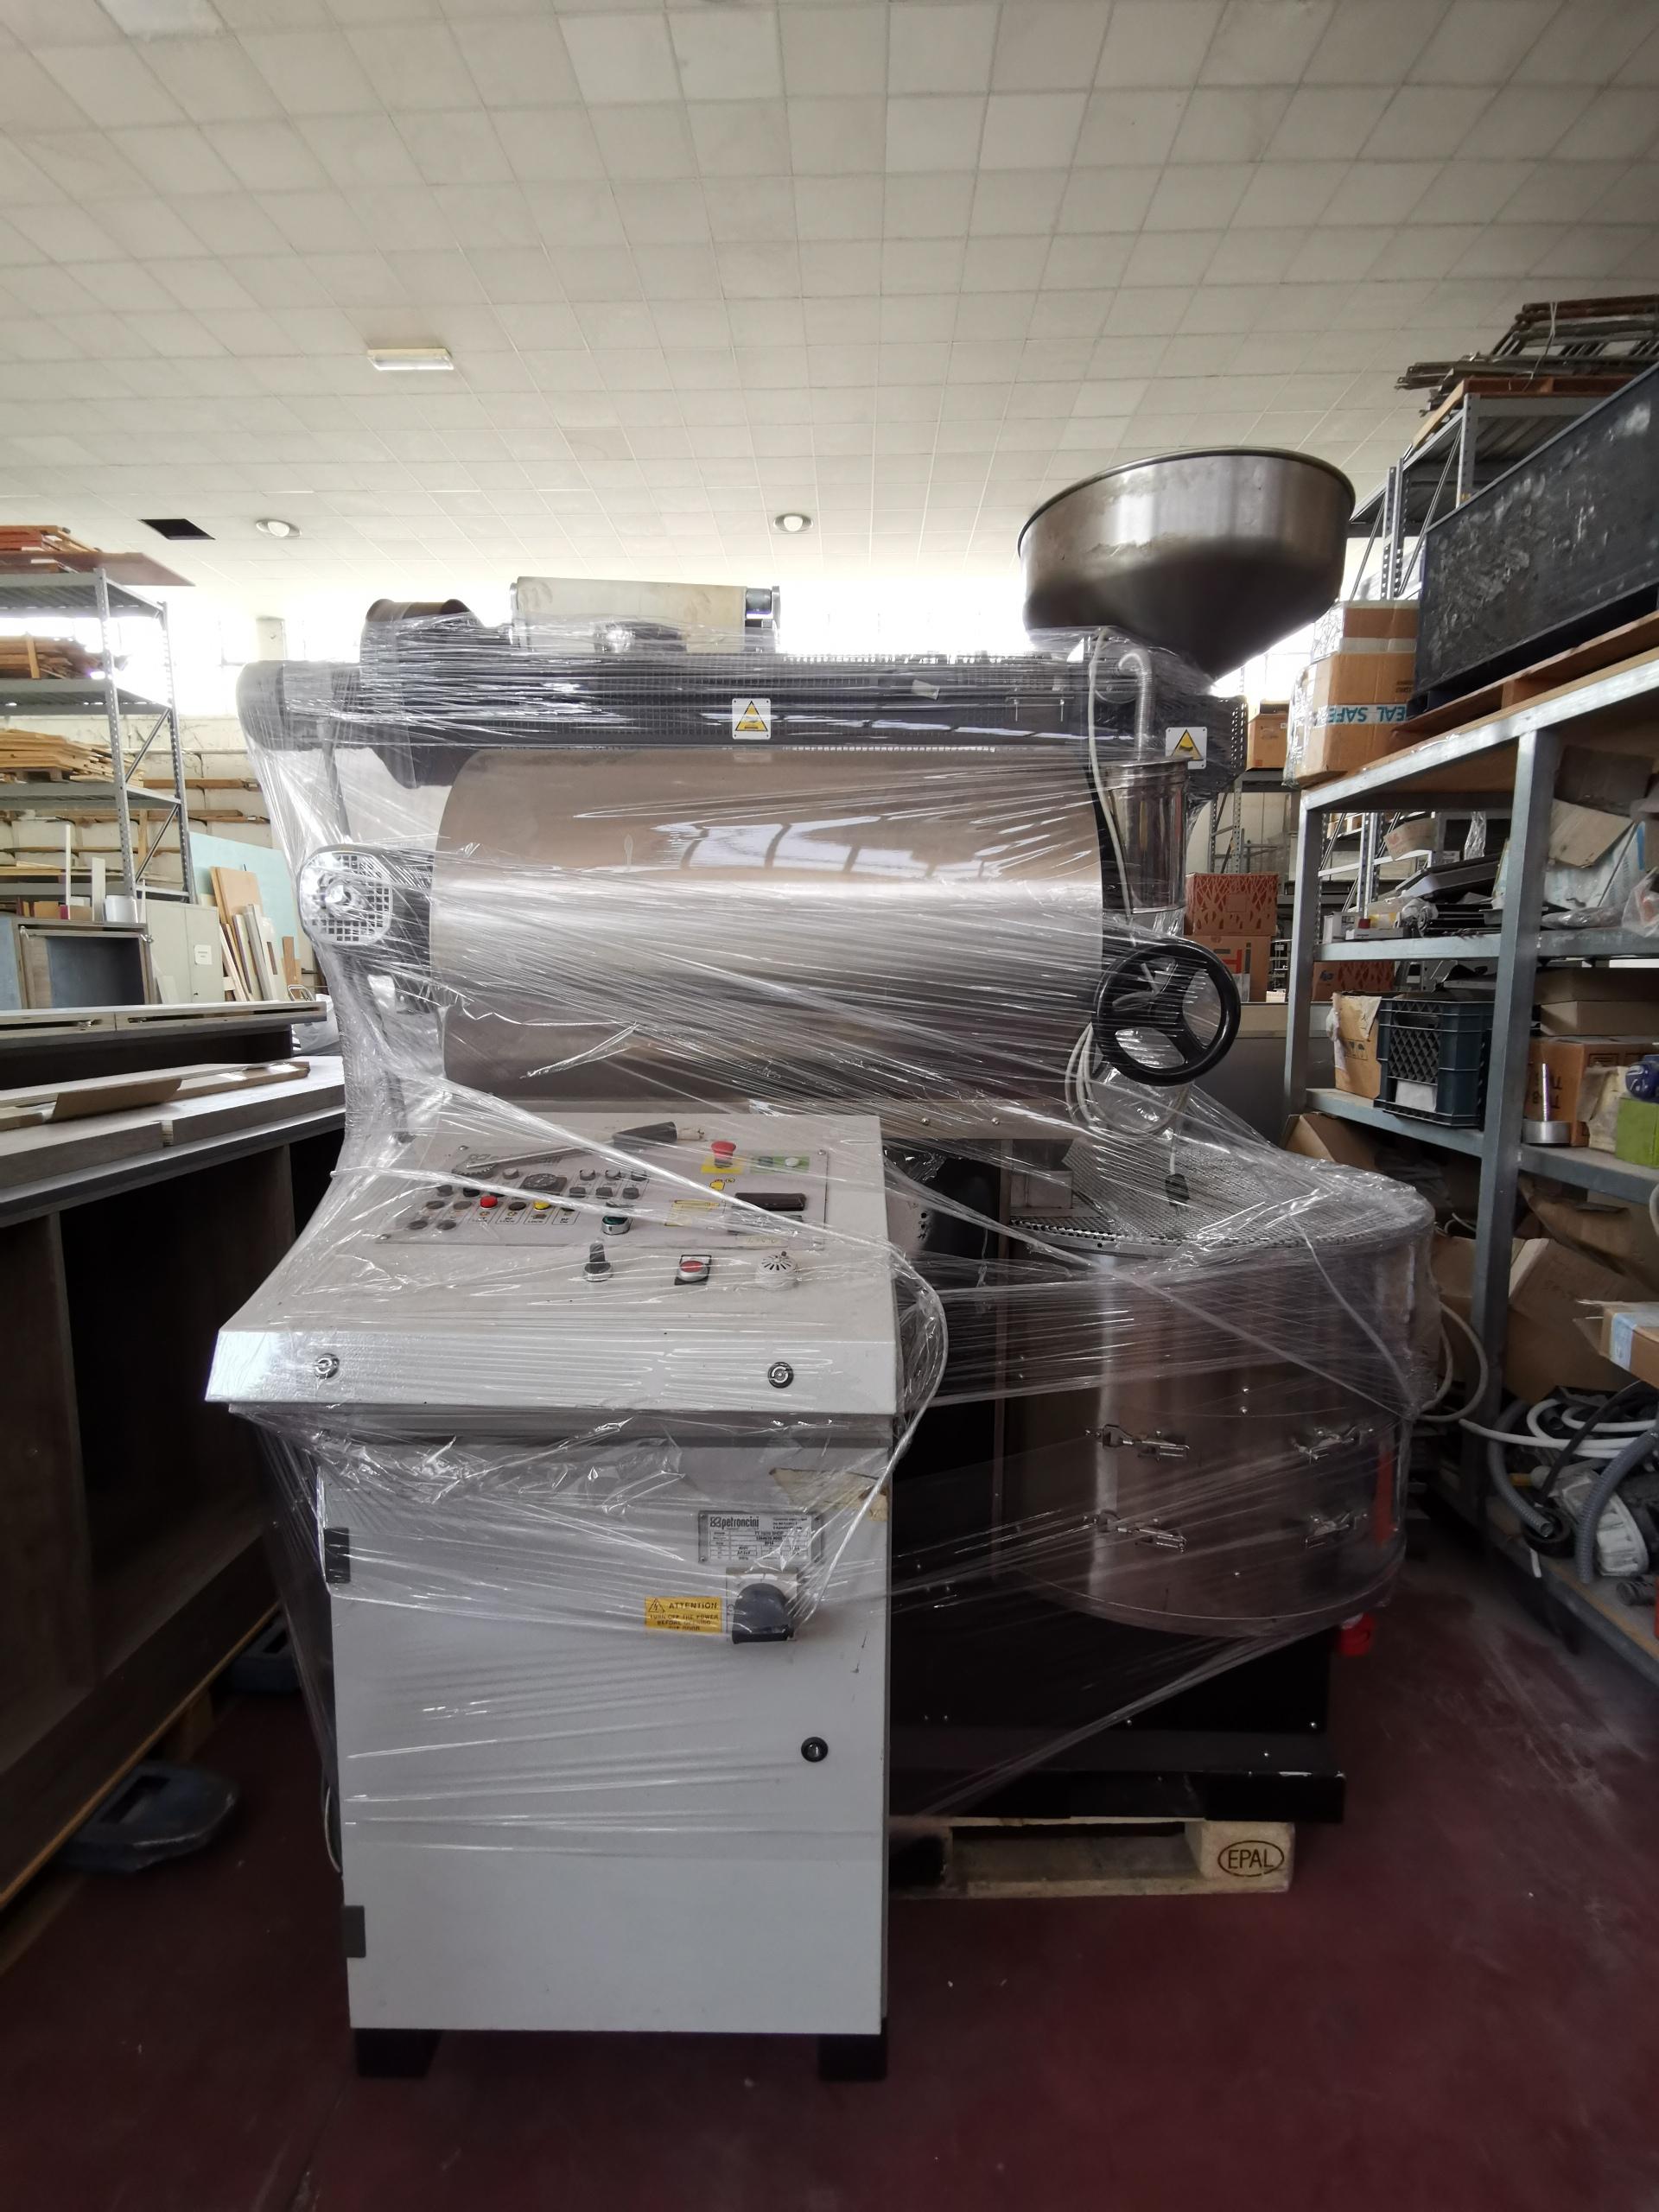 Macchine lavorazione caffè in vendita